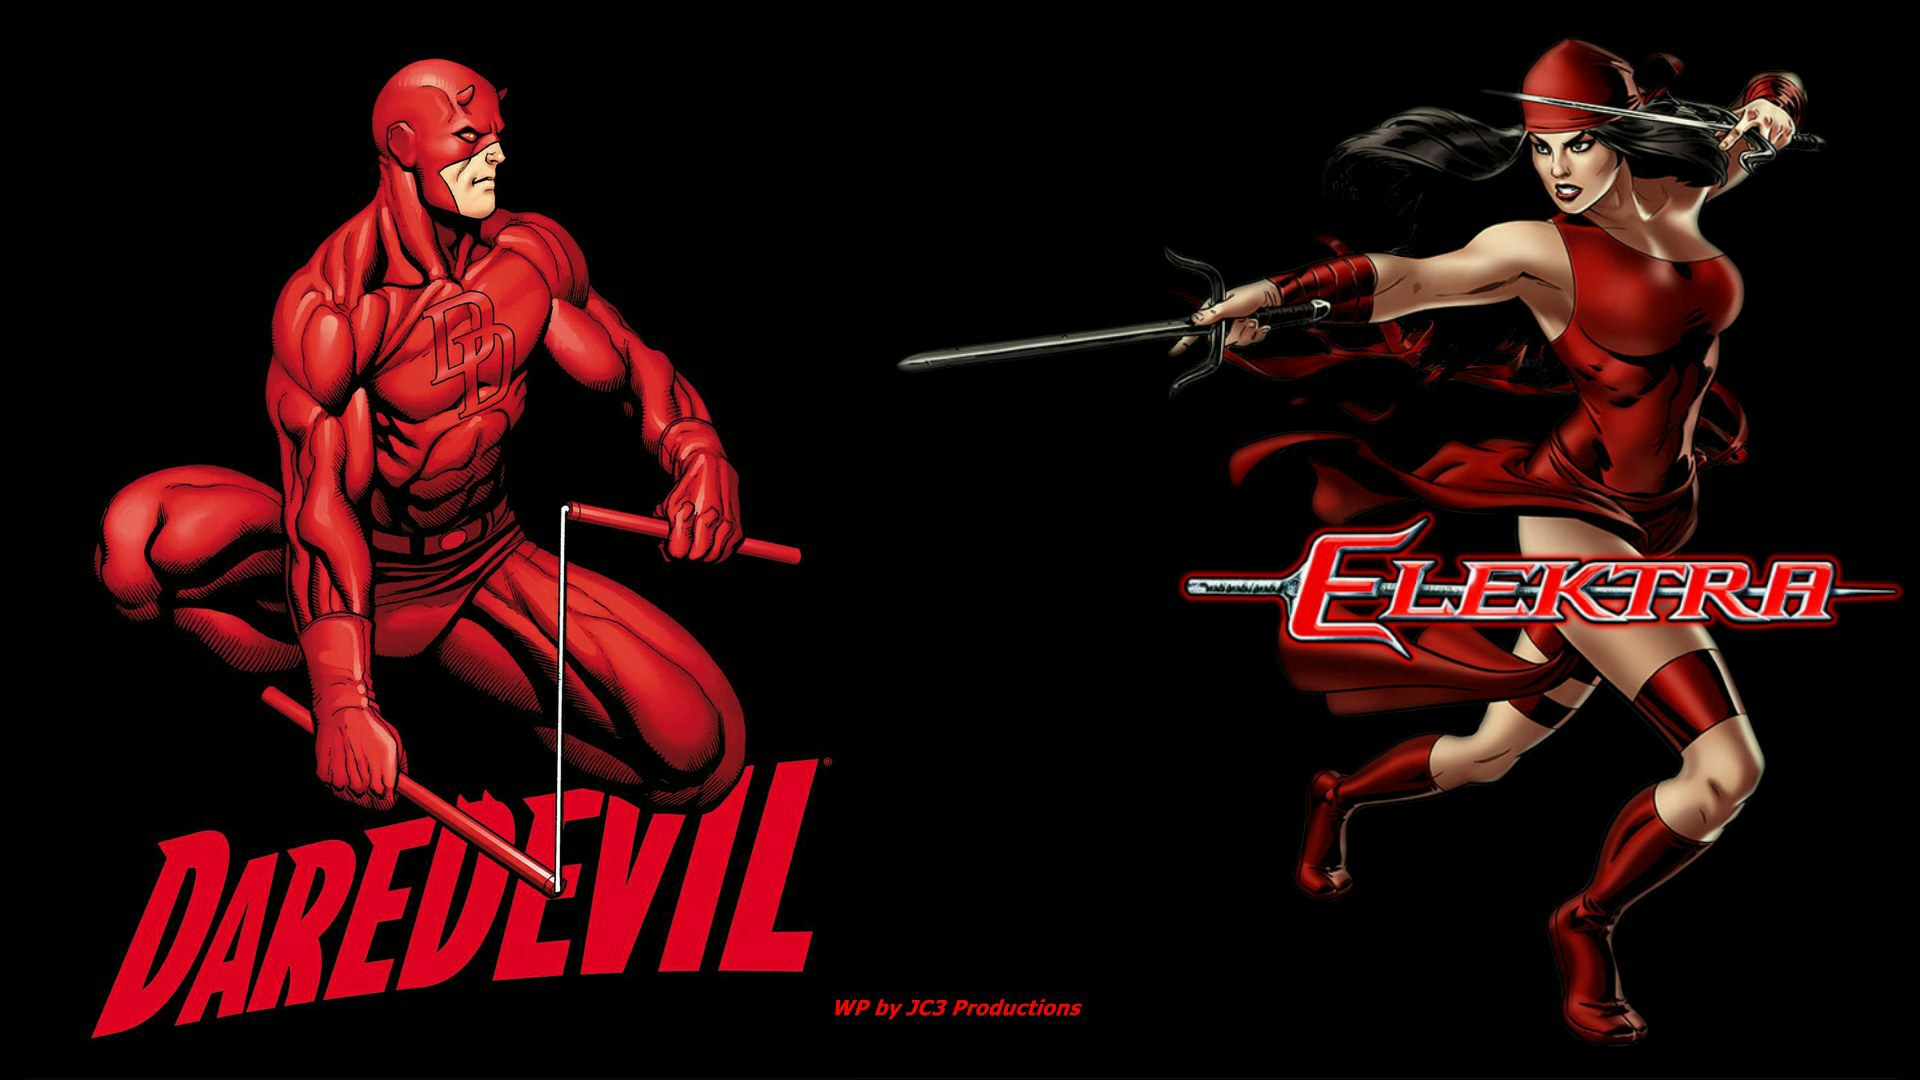 Daredevil Wallpaper - Elektra Together by Curtdawg53